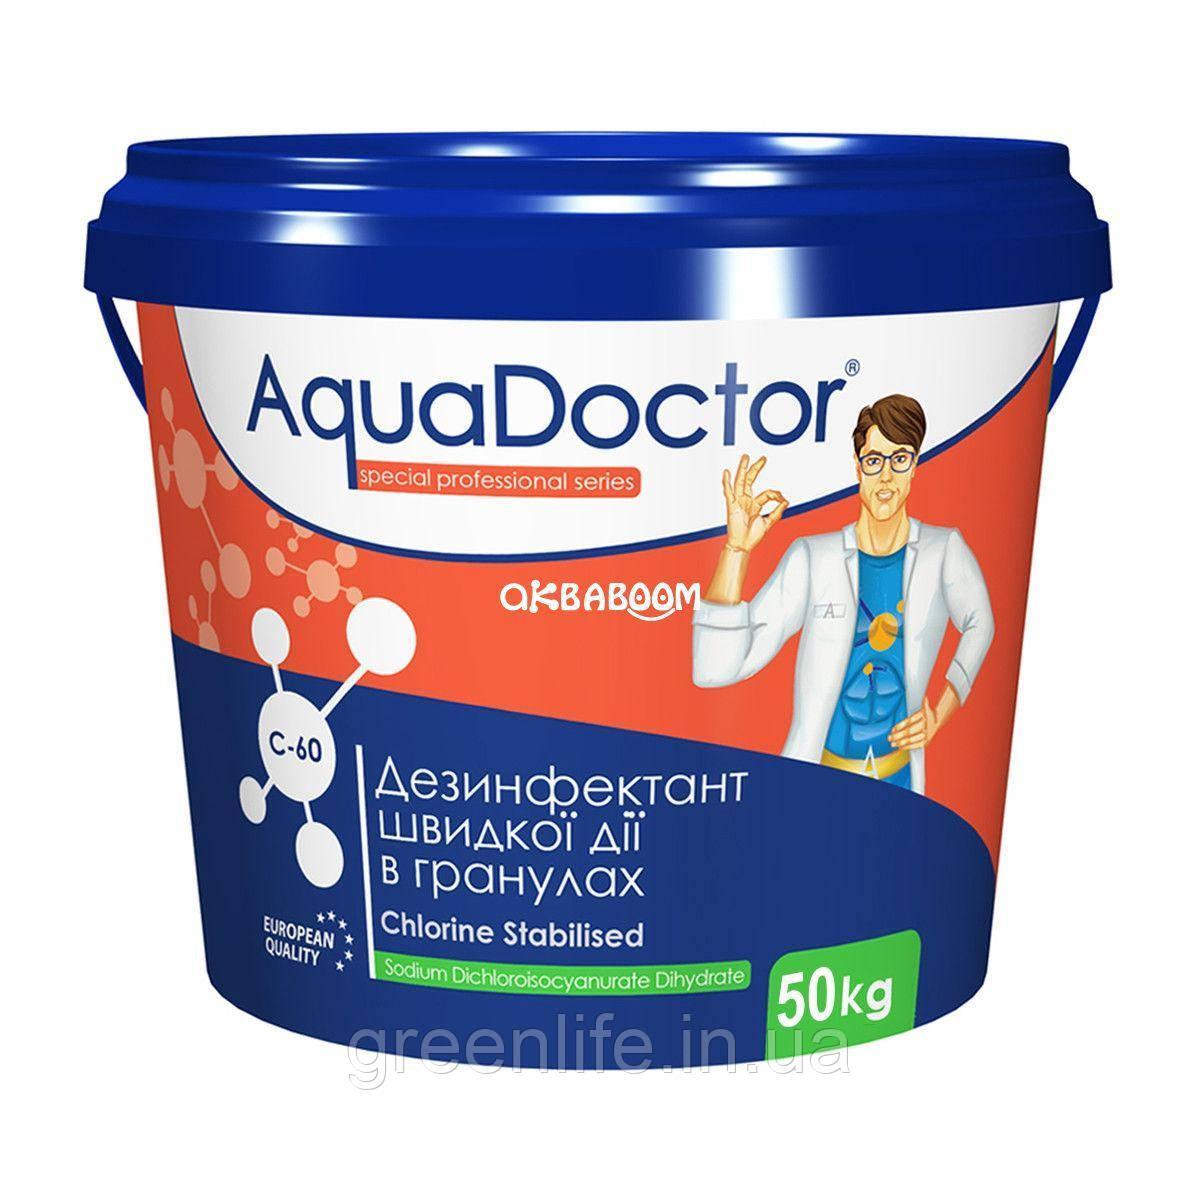 Шок хлор в гранулах Aquadoctor C60 (50 кг), Аквадоктор, в гранулах 50 кг